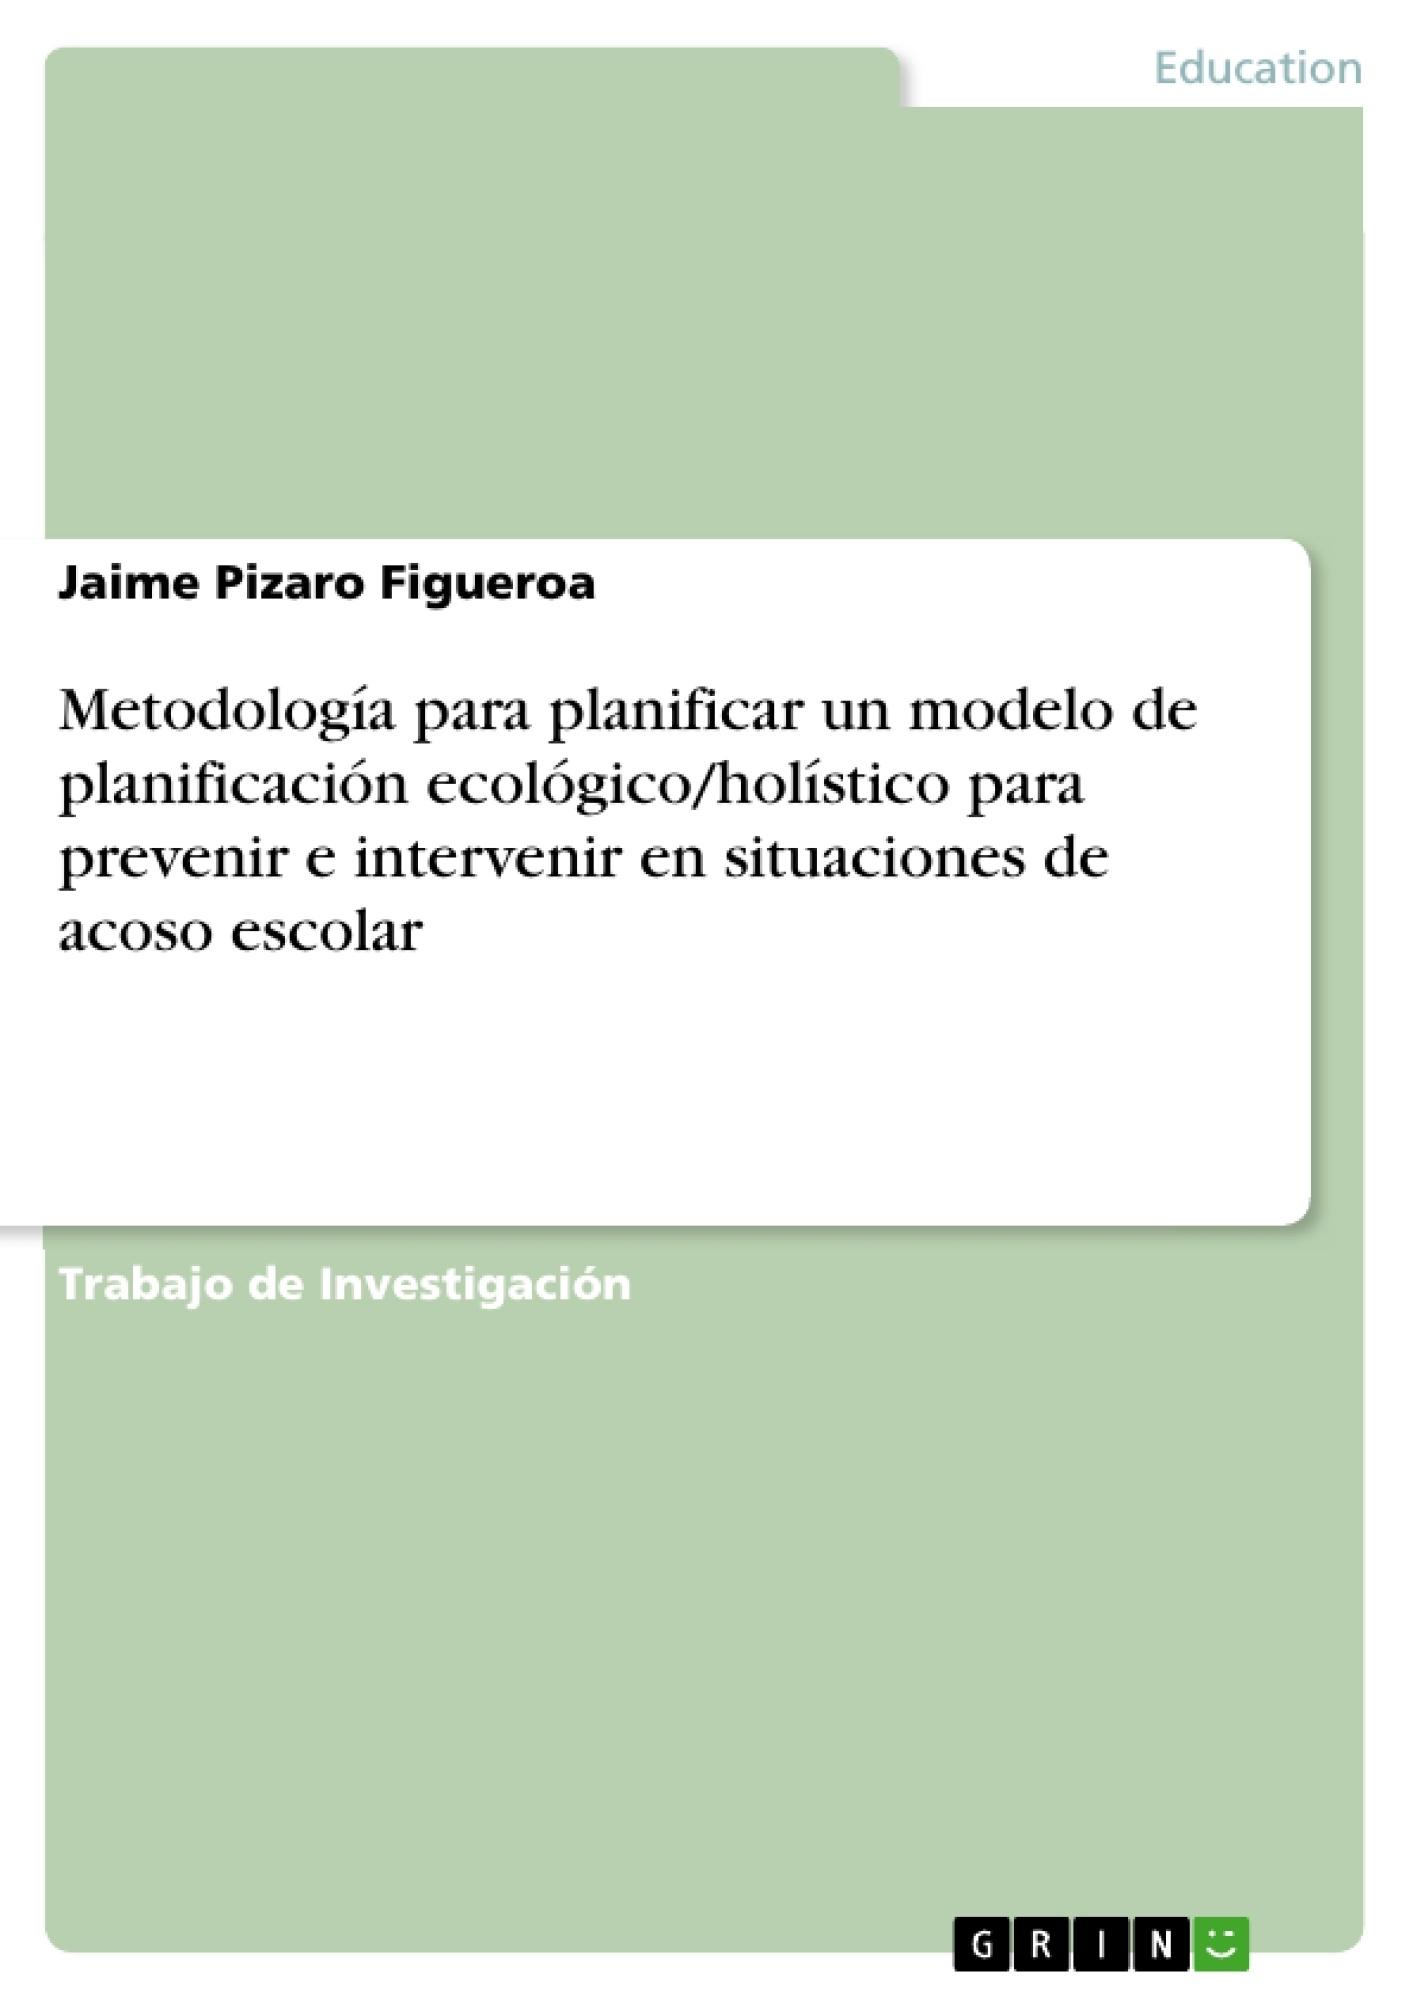 Título: Metodología para planificar un modelo de planificación ecológico/holístico para prevenir e intervenir en situaciones de acoso escolar